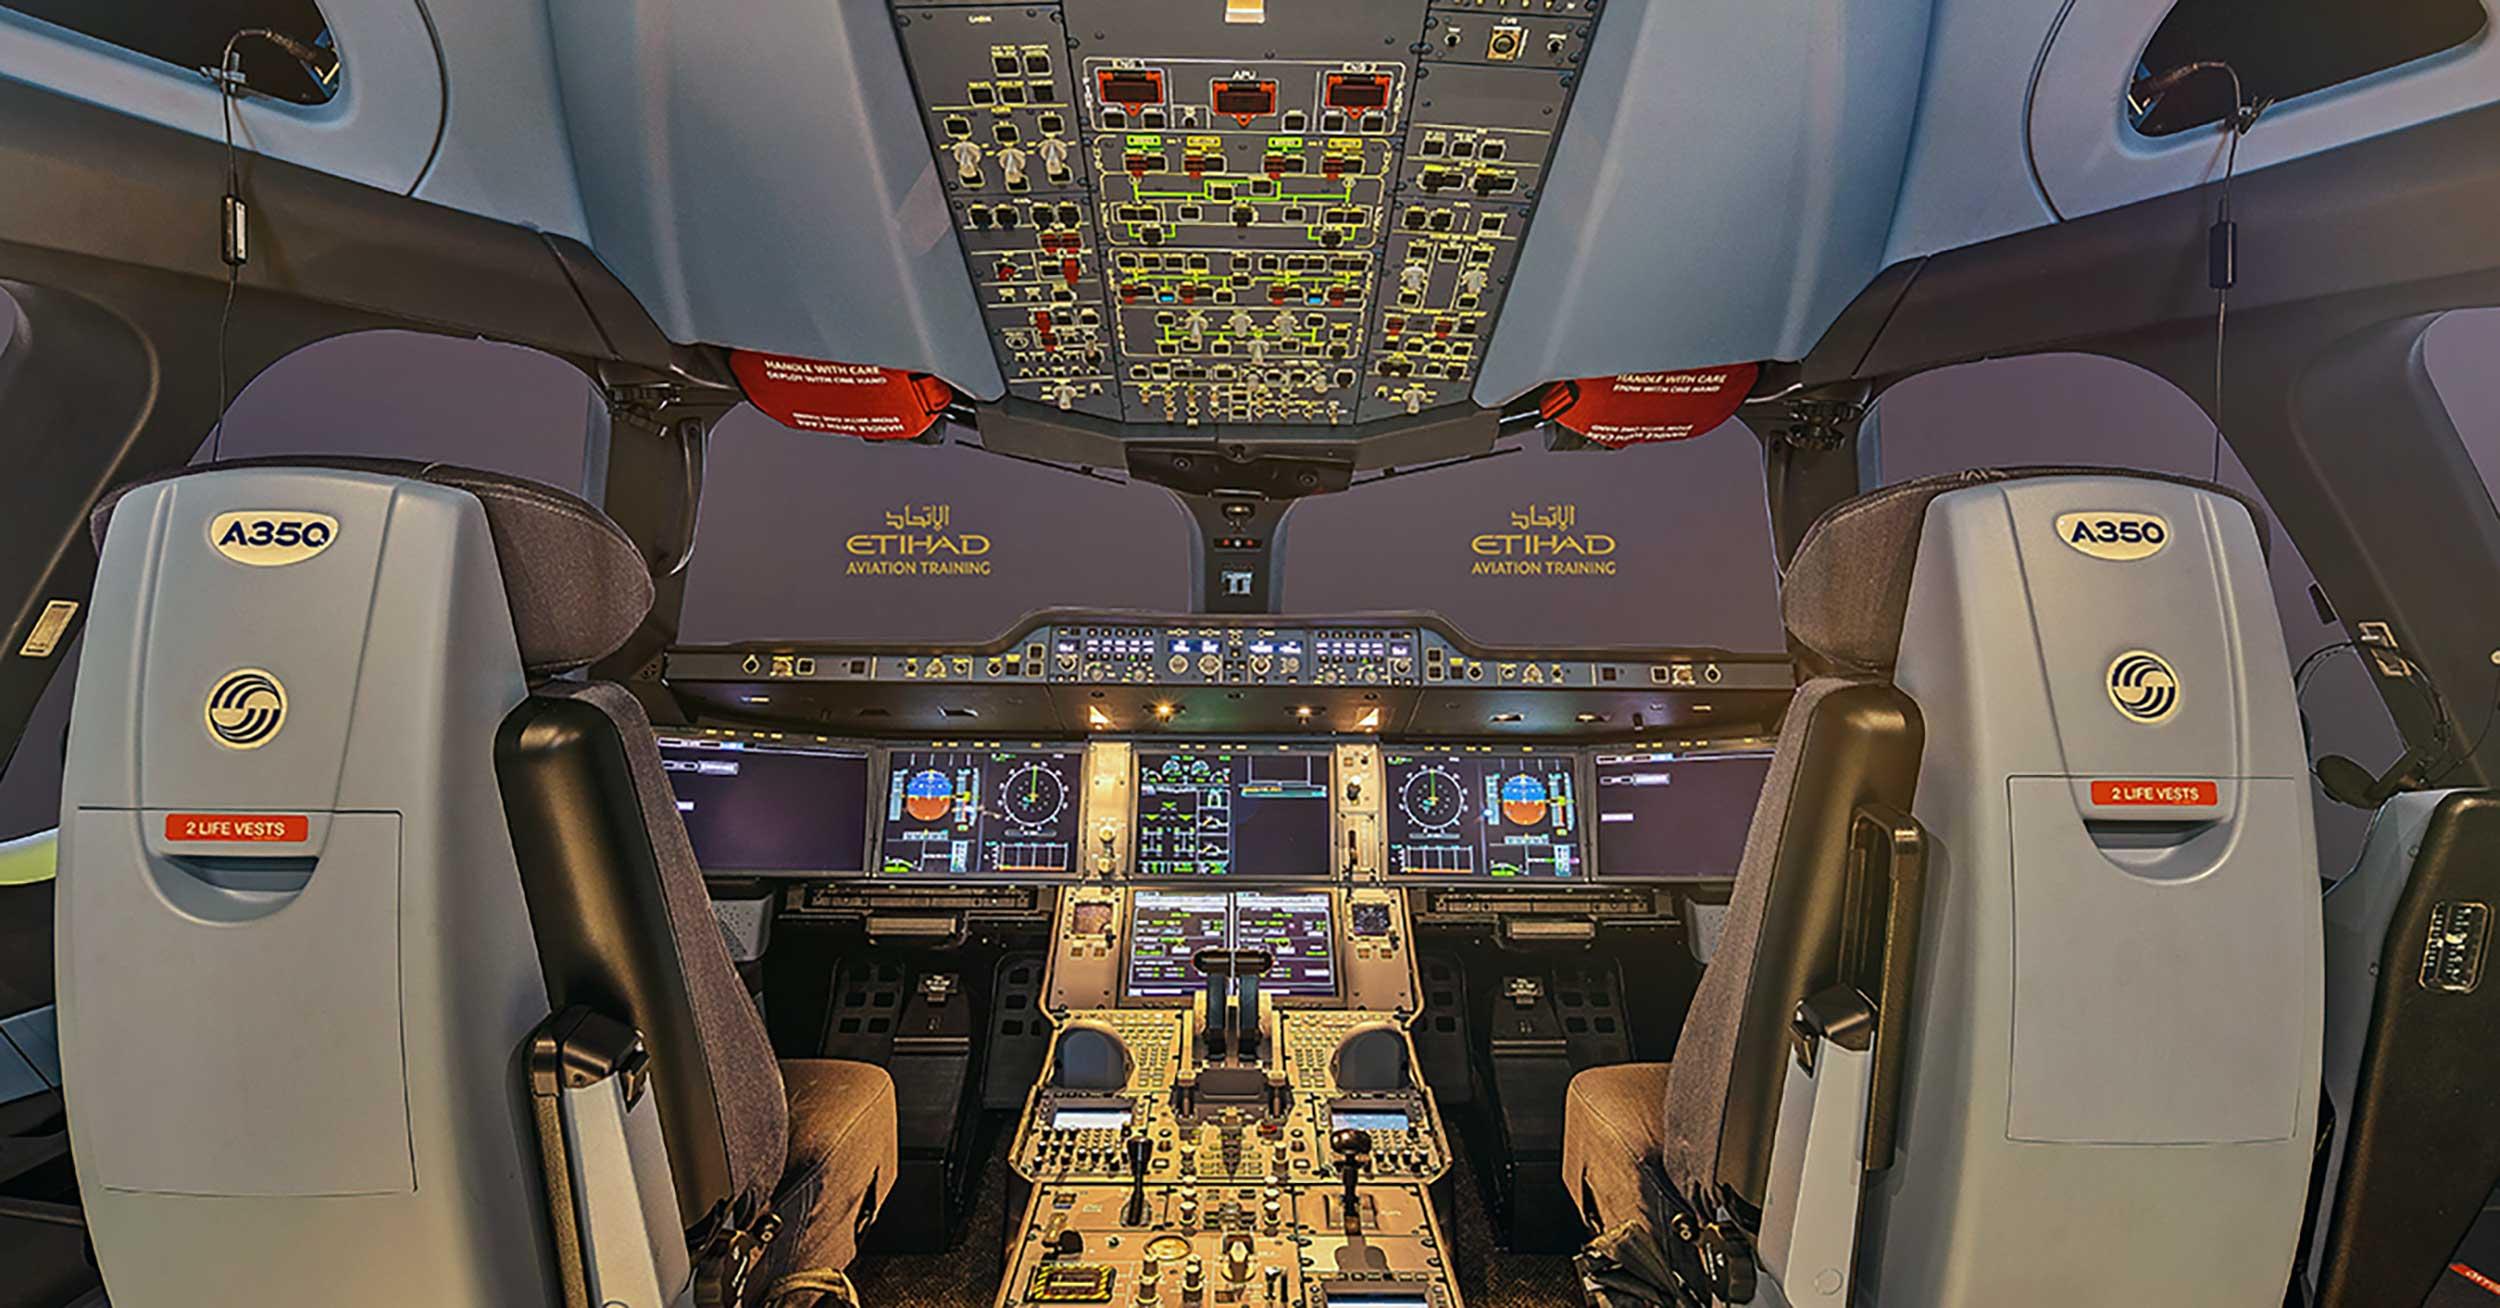 Etihad A350 sim